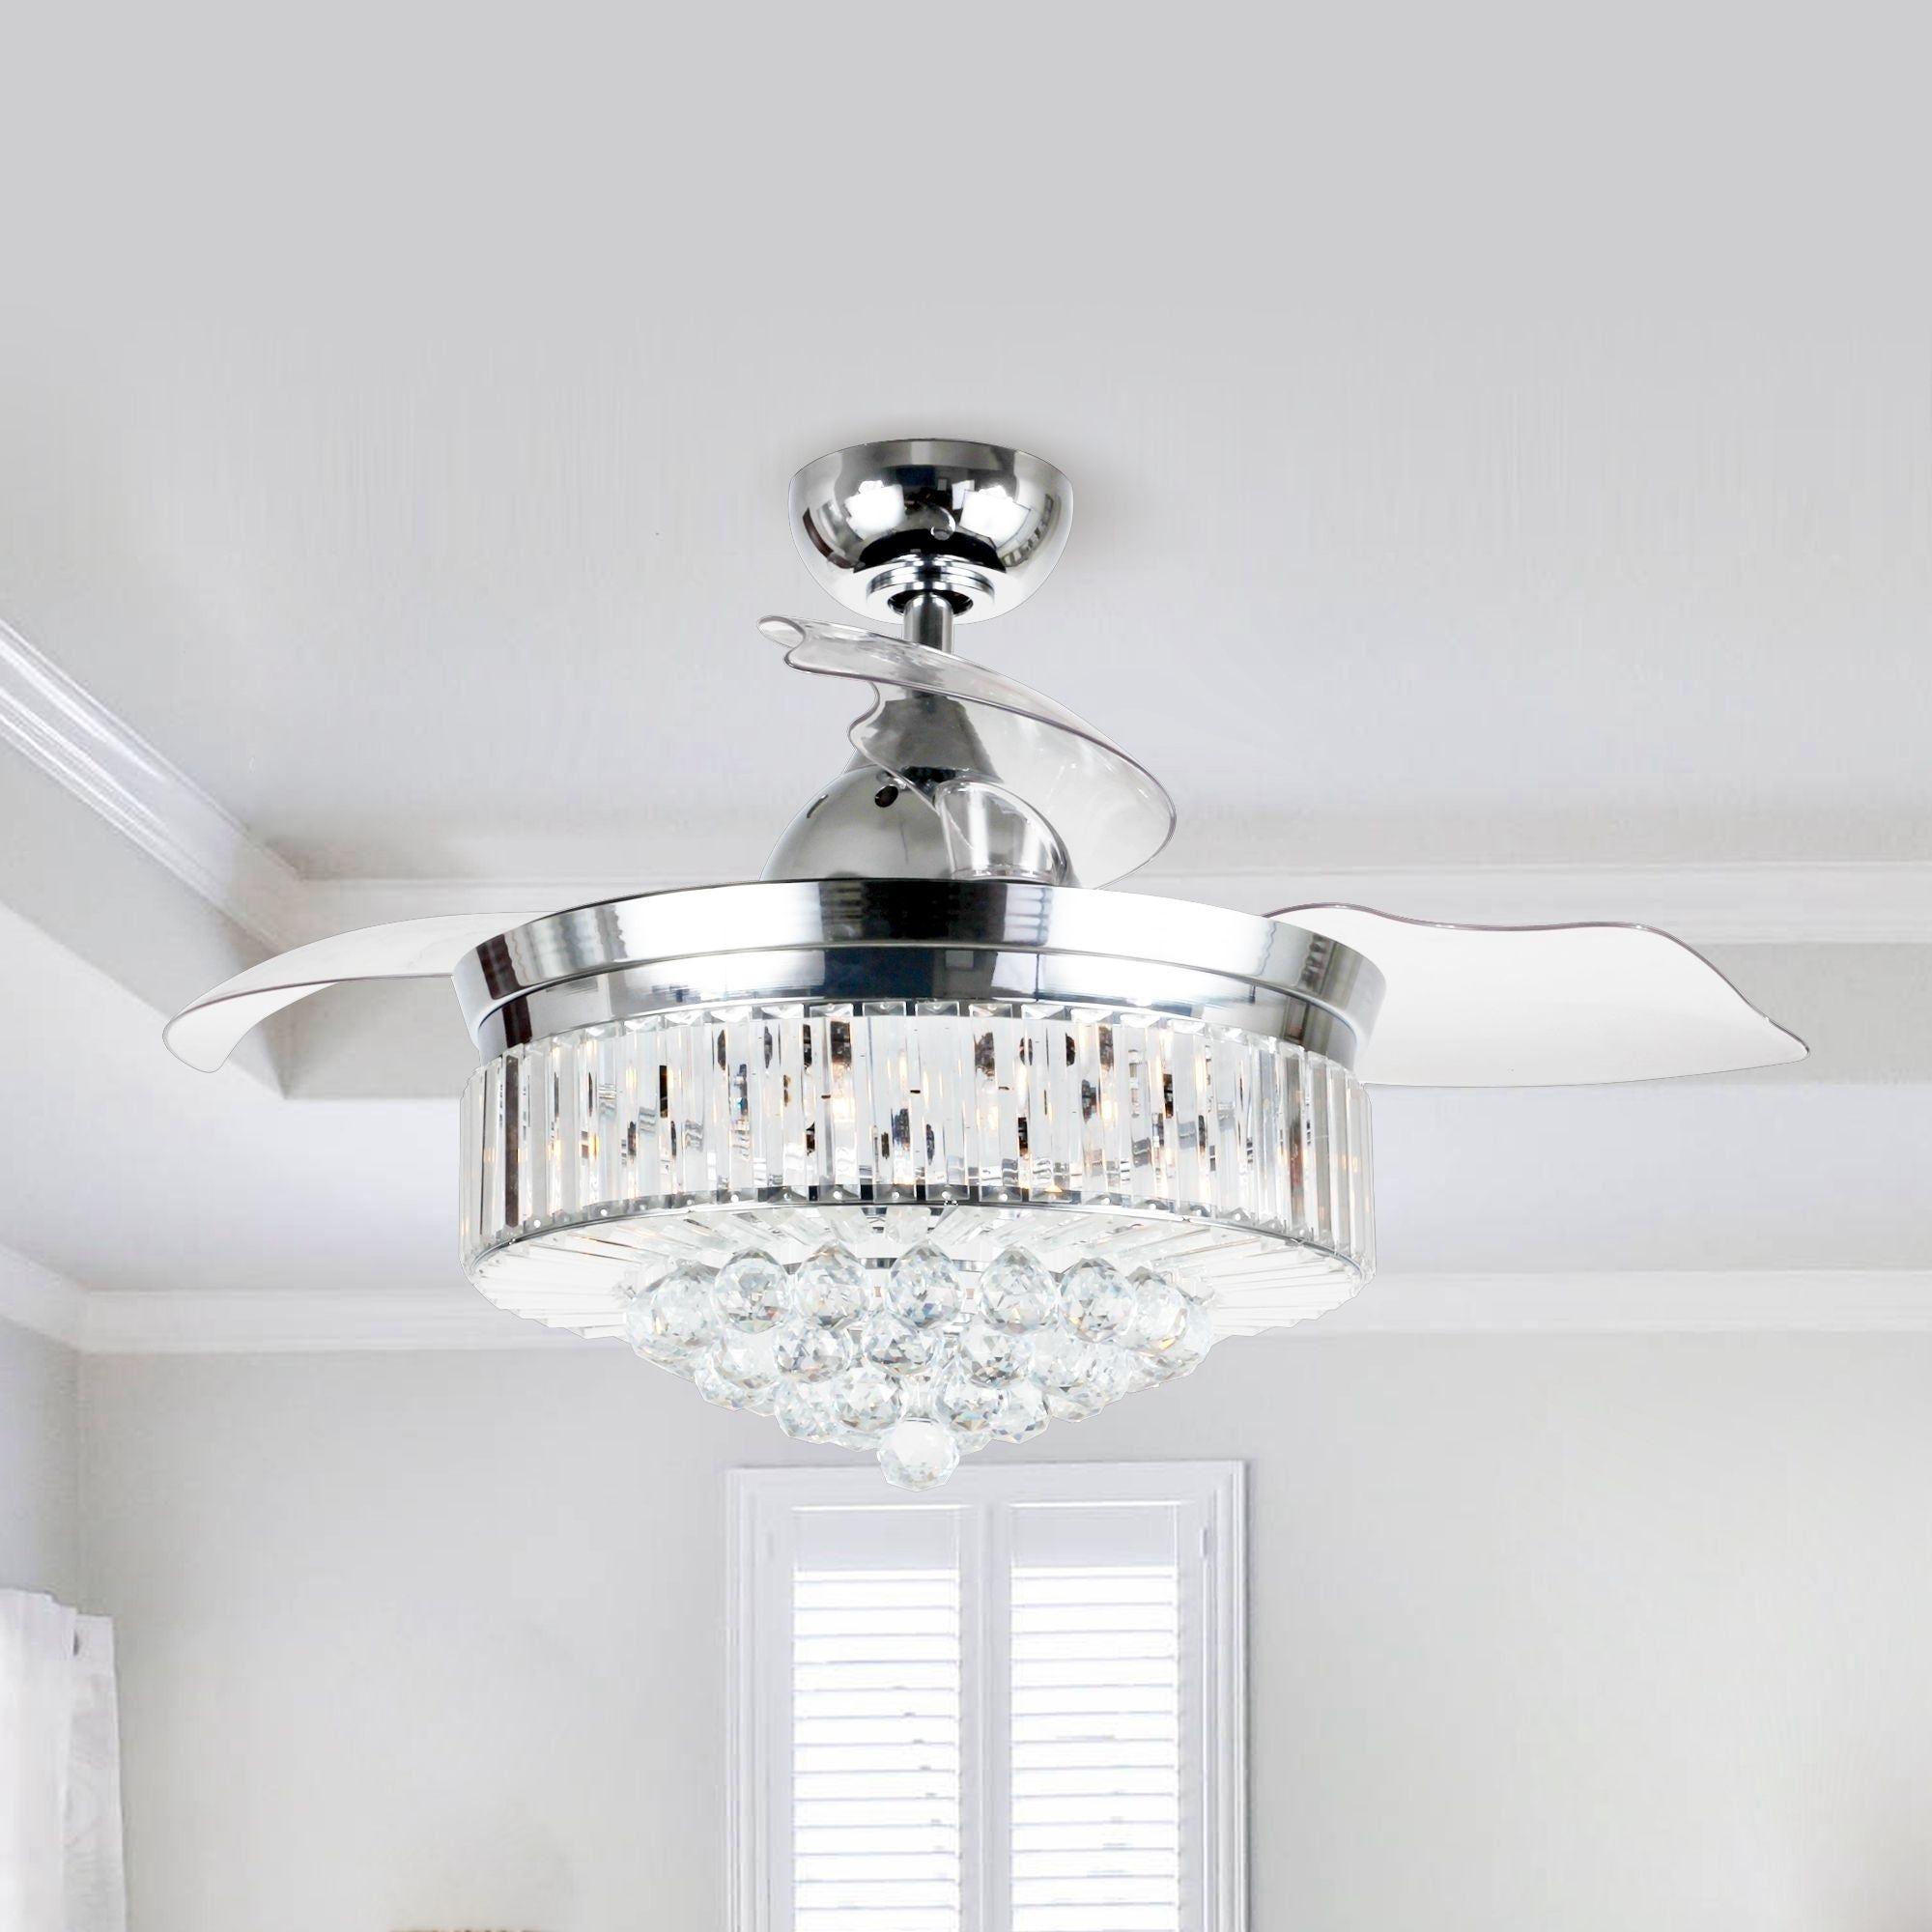 Ceiling Fans Ceiling Fan Ceiling Fan With Remote Ceiling Fan With Light